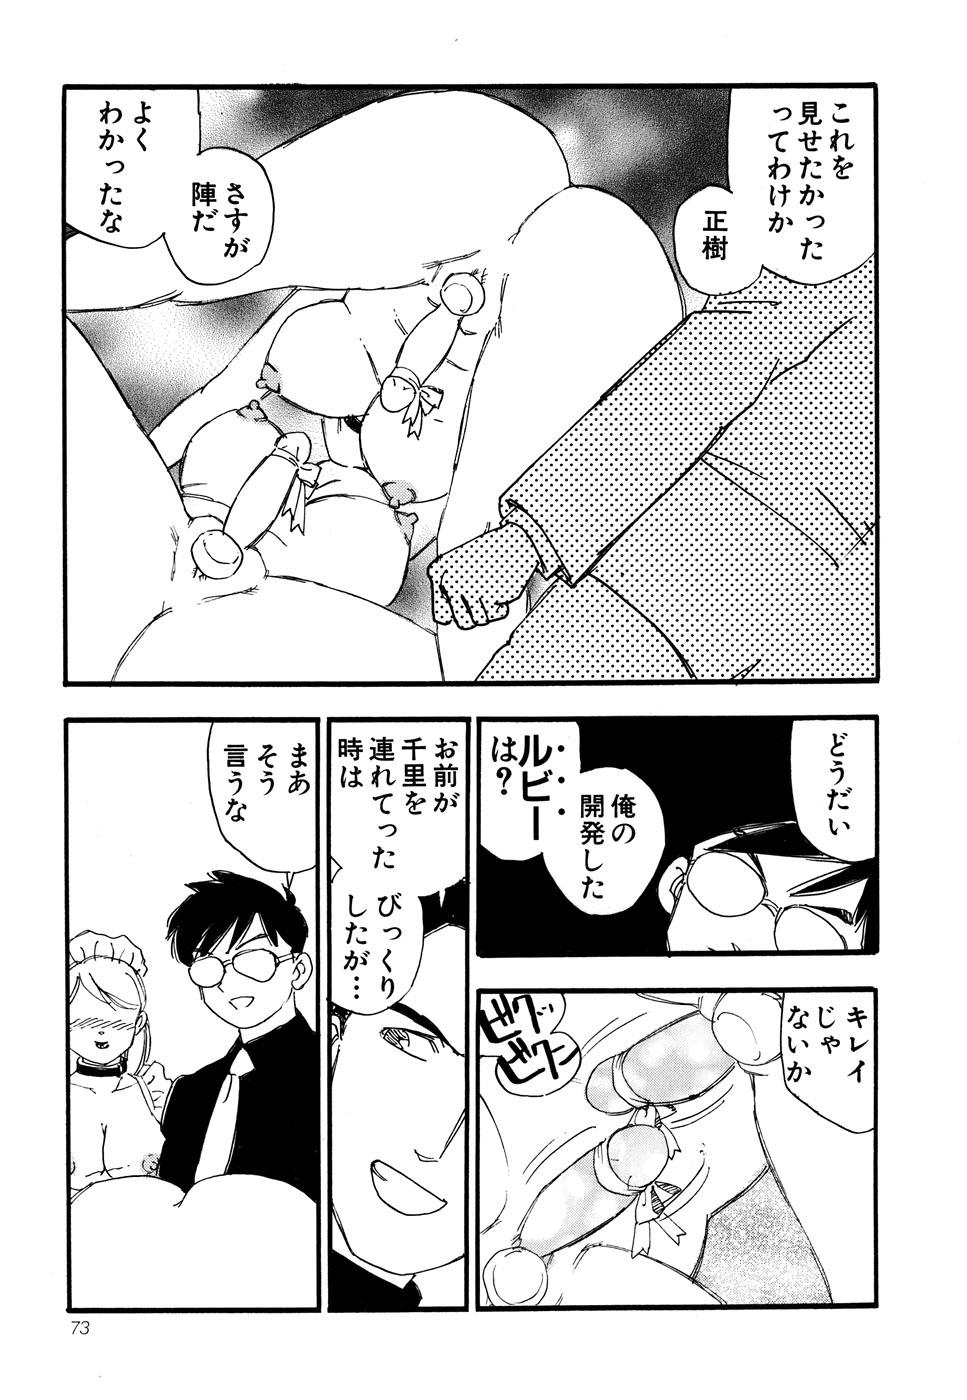 G-drive Vol.1 Ryoujokuhen 72